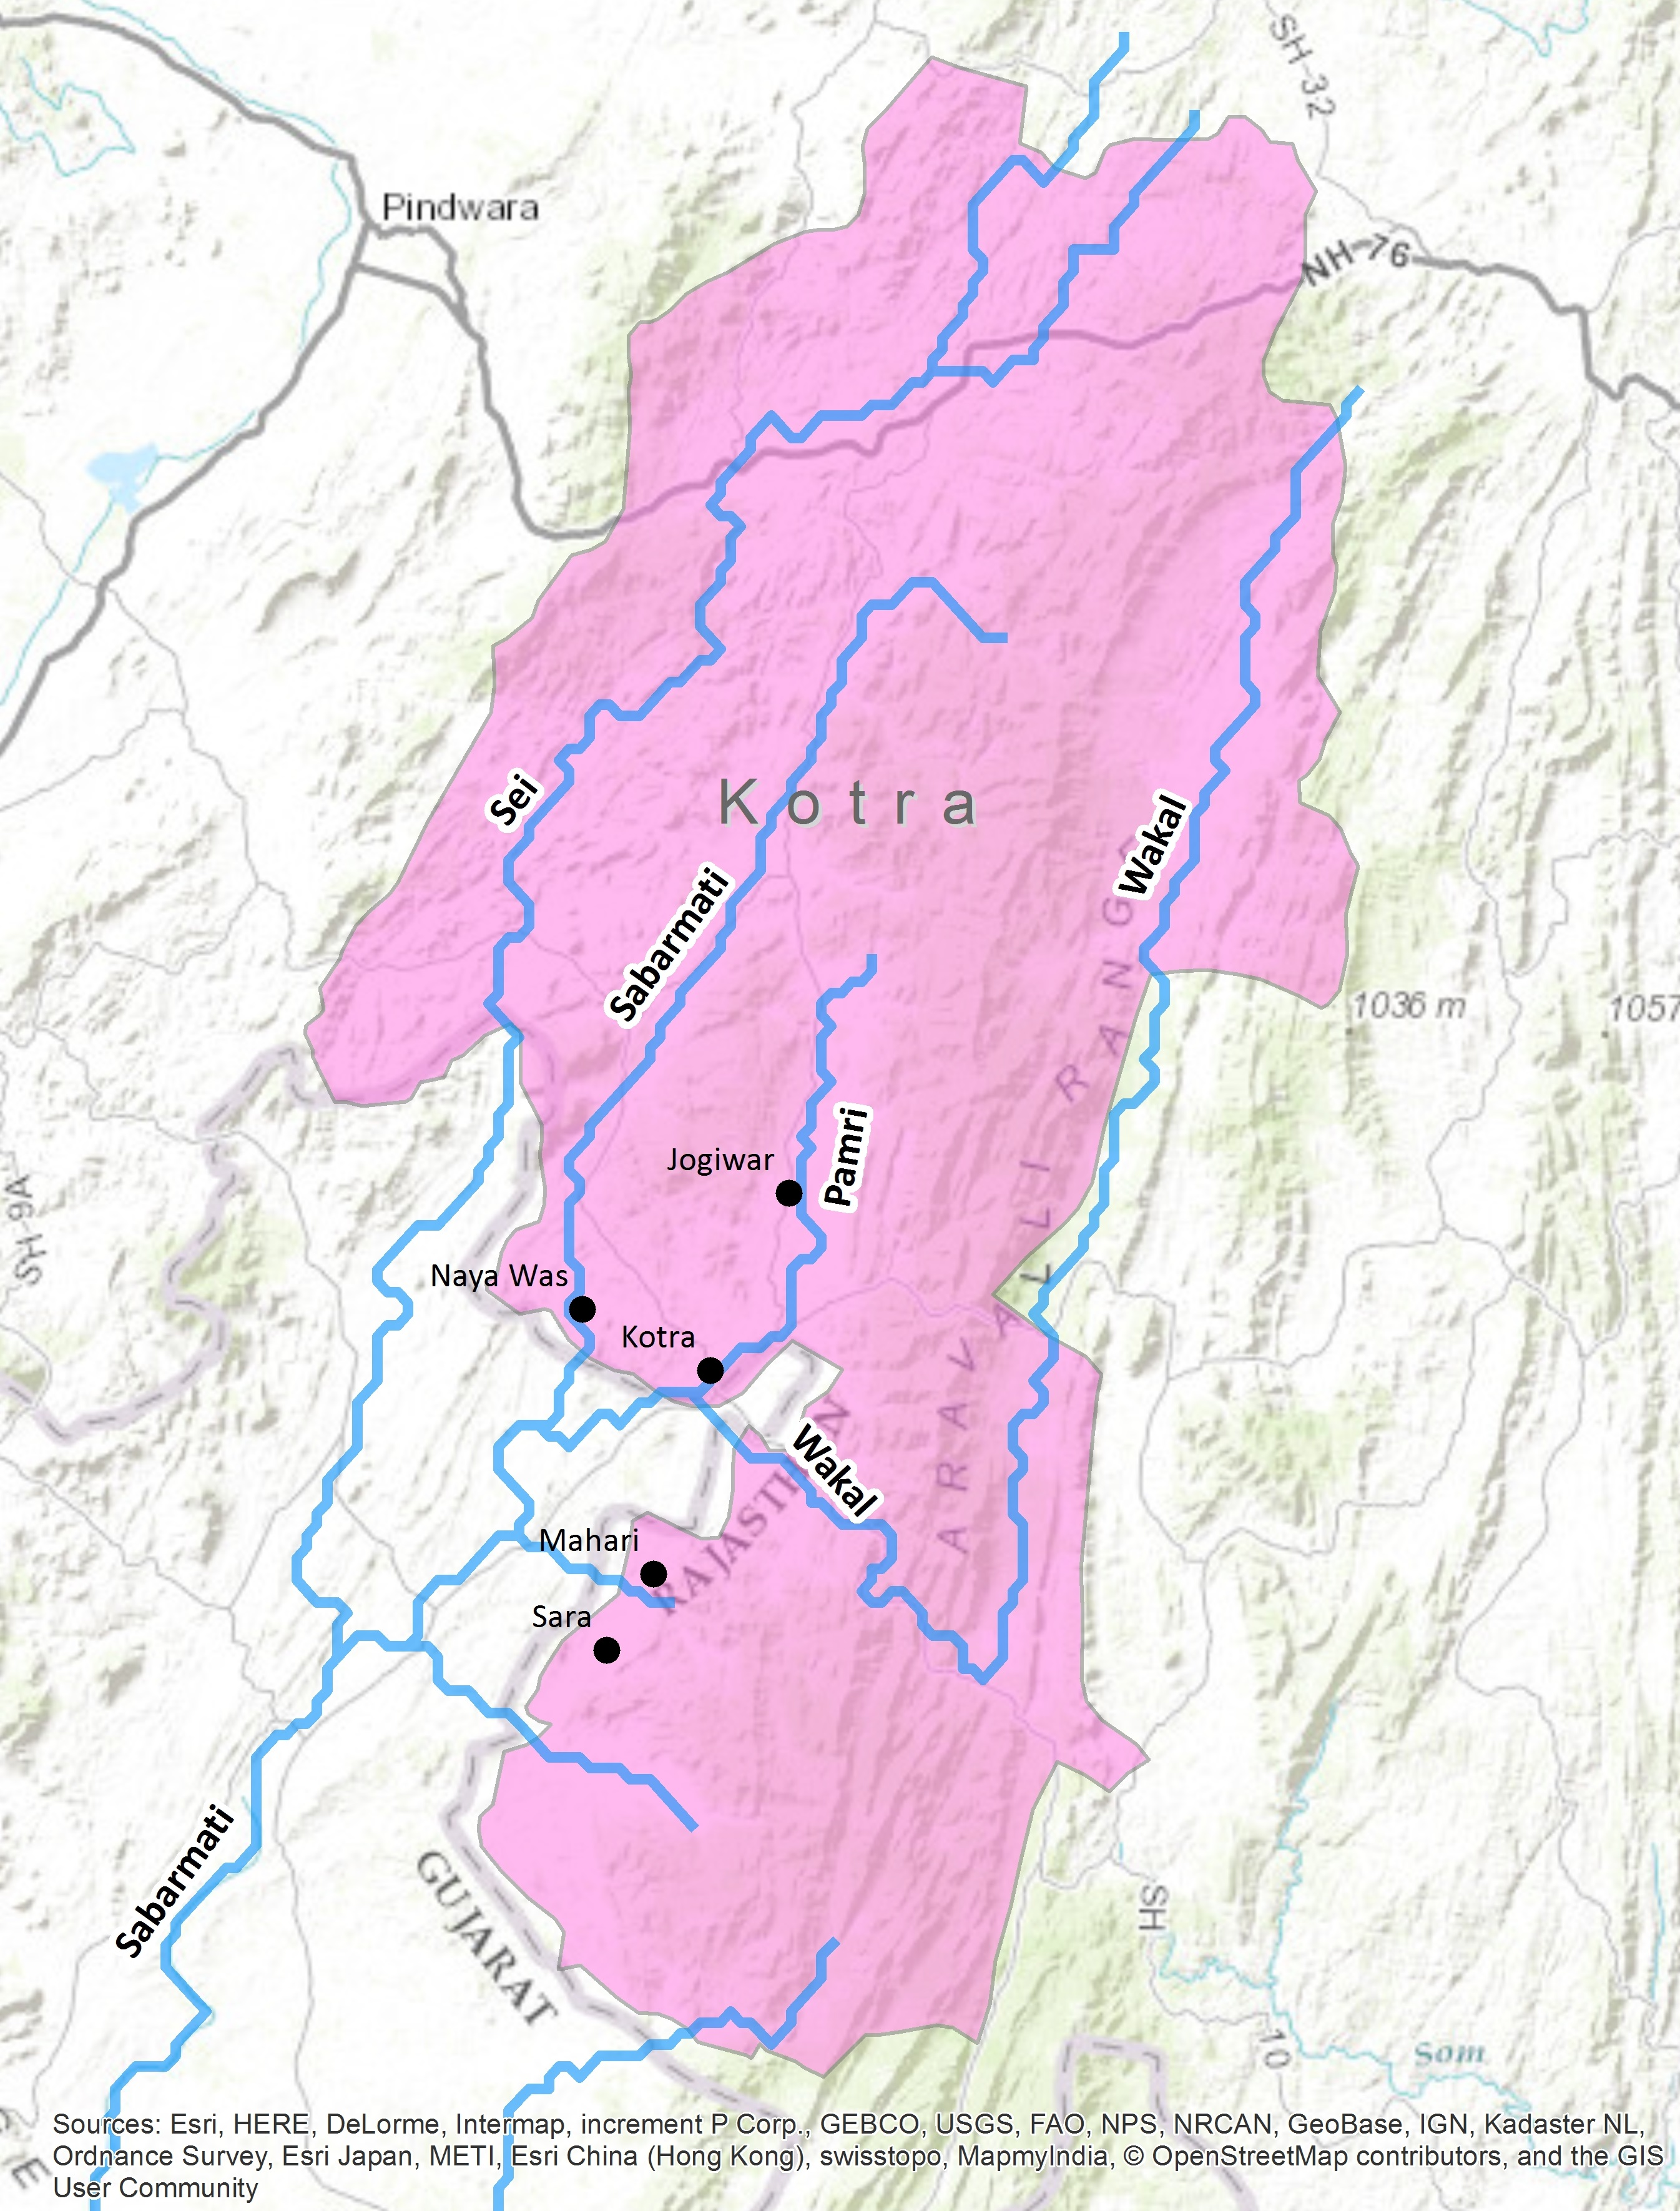 Filerivers Of Kotra Tehsil Udaipur District Rajasthan Indiajpg